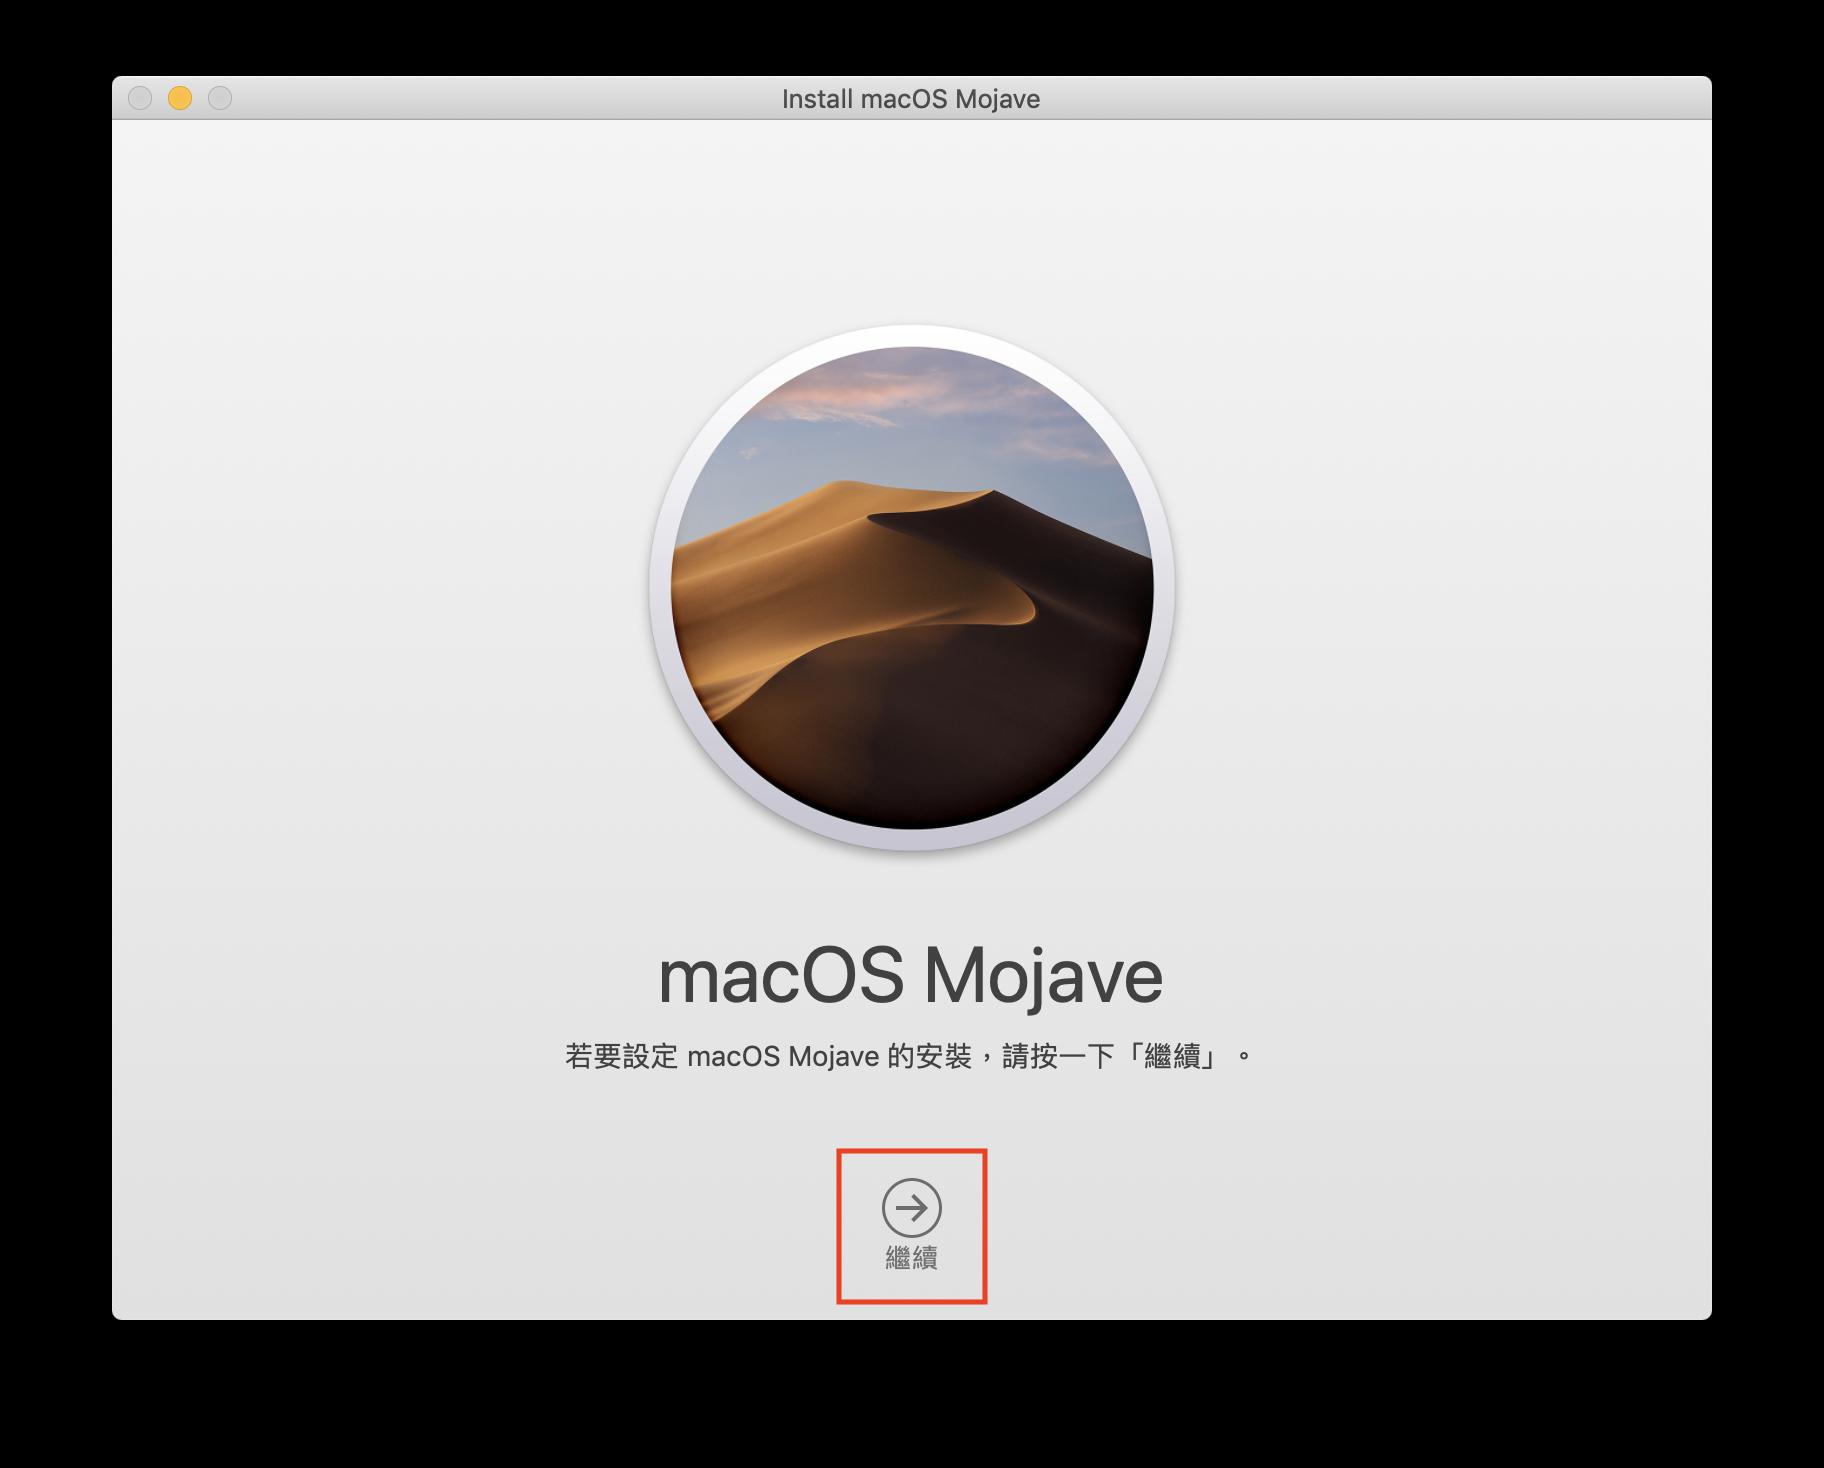 macOS 10.14、macOS Mojave、macOS 10.14 Beta